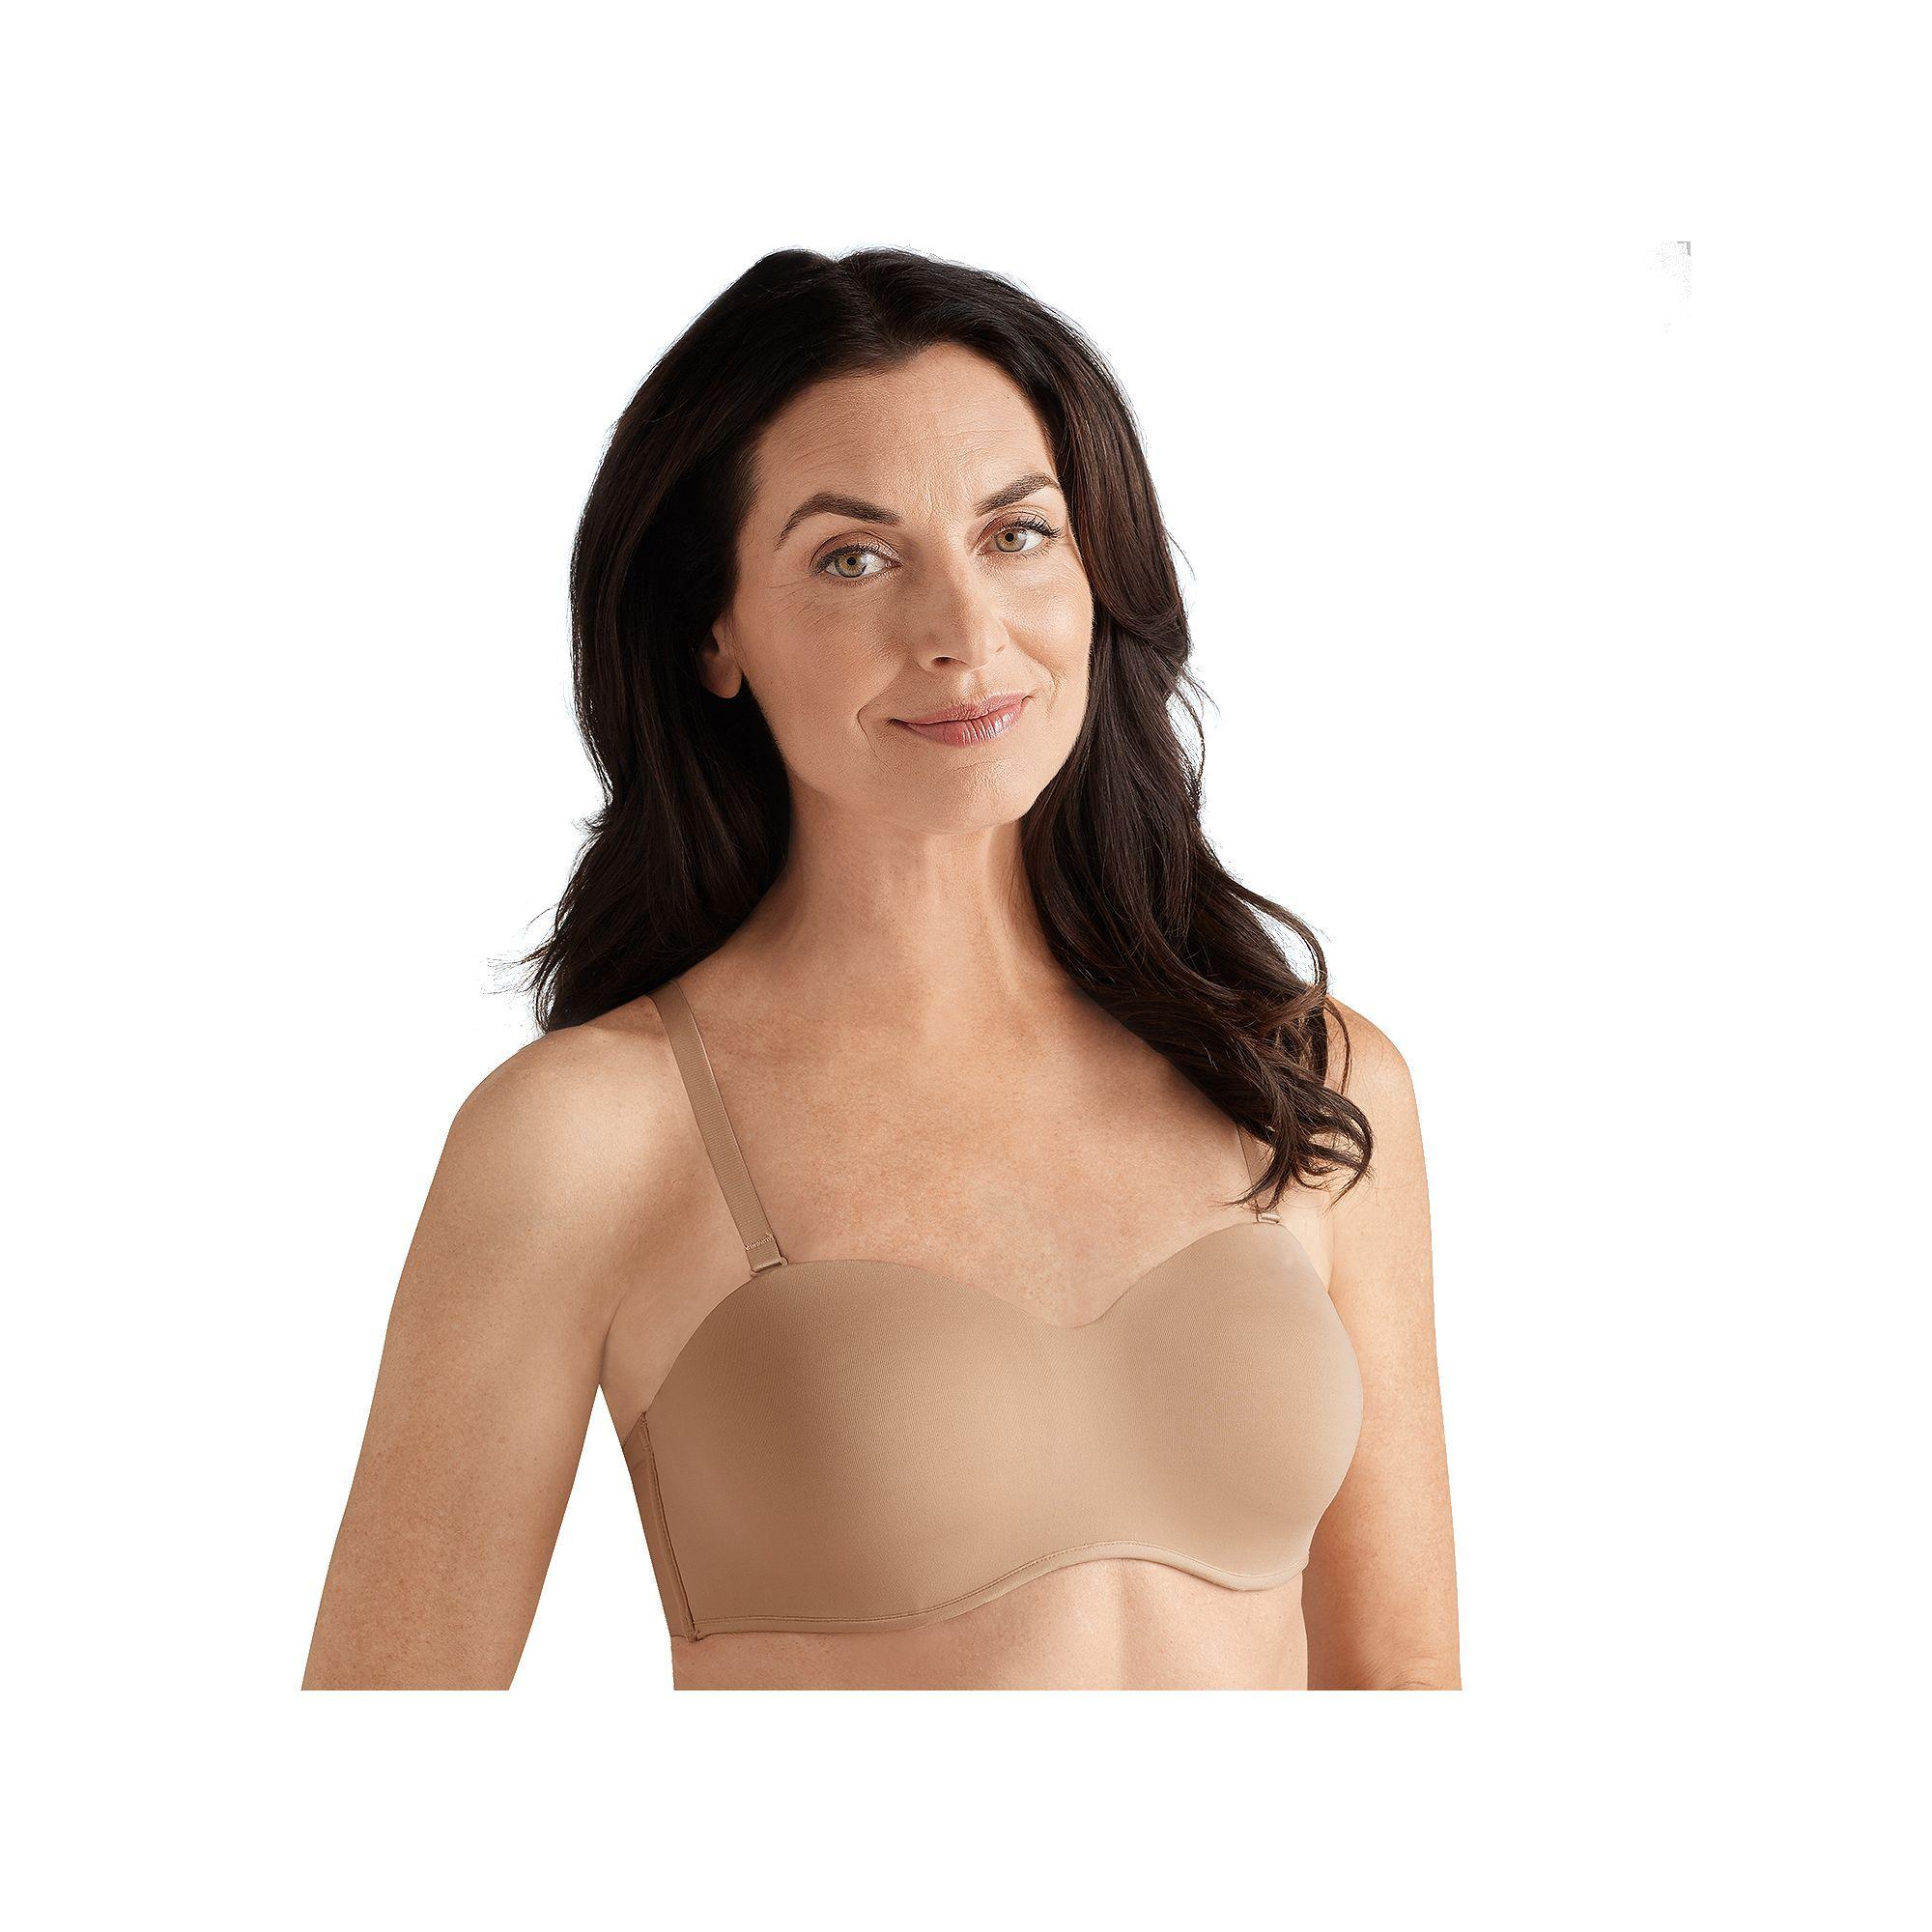 Amoena Bra: Barbara Convertible Strapless Bra 2457 - Women's, Size: 38 B,  Black